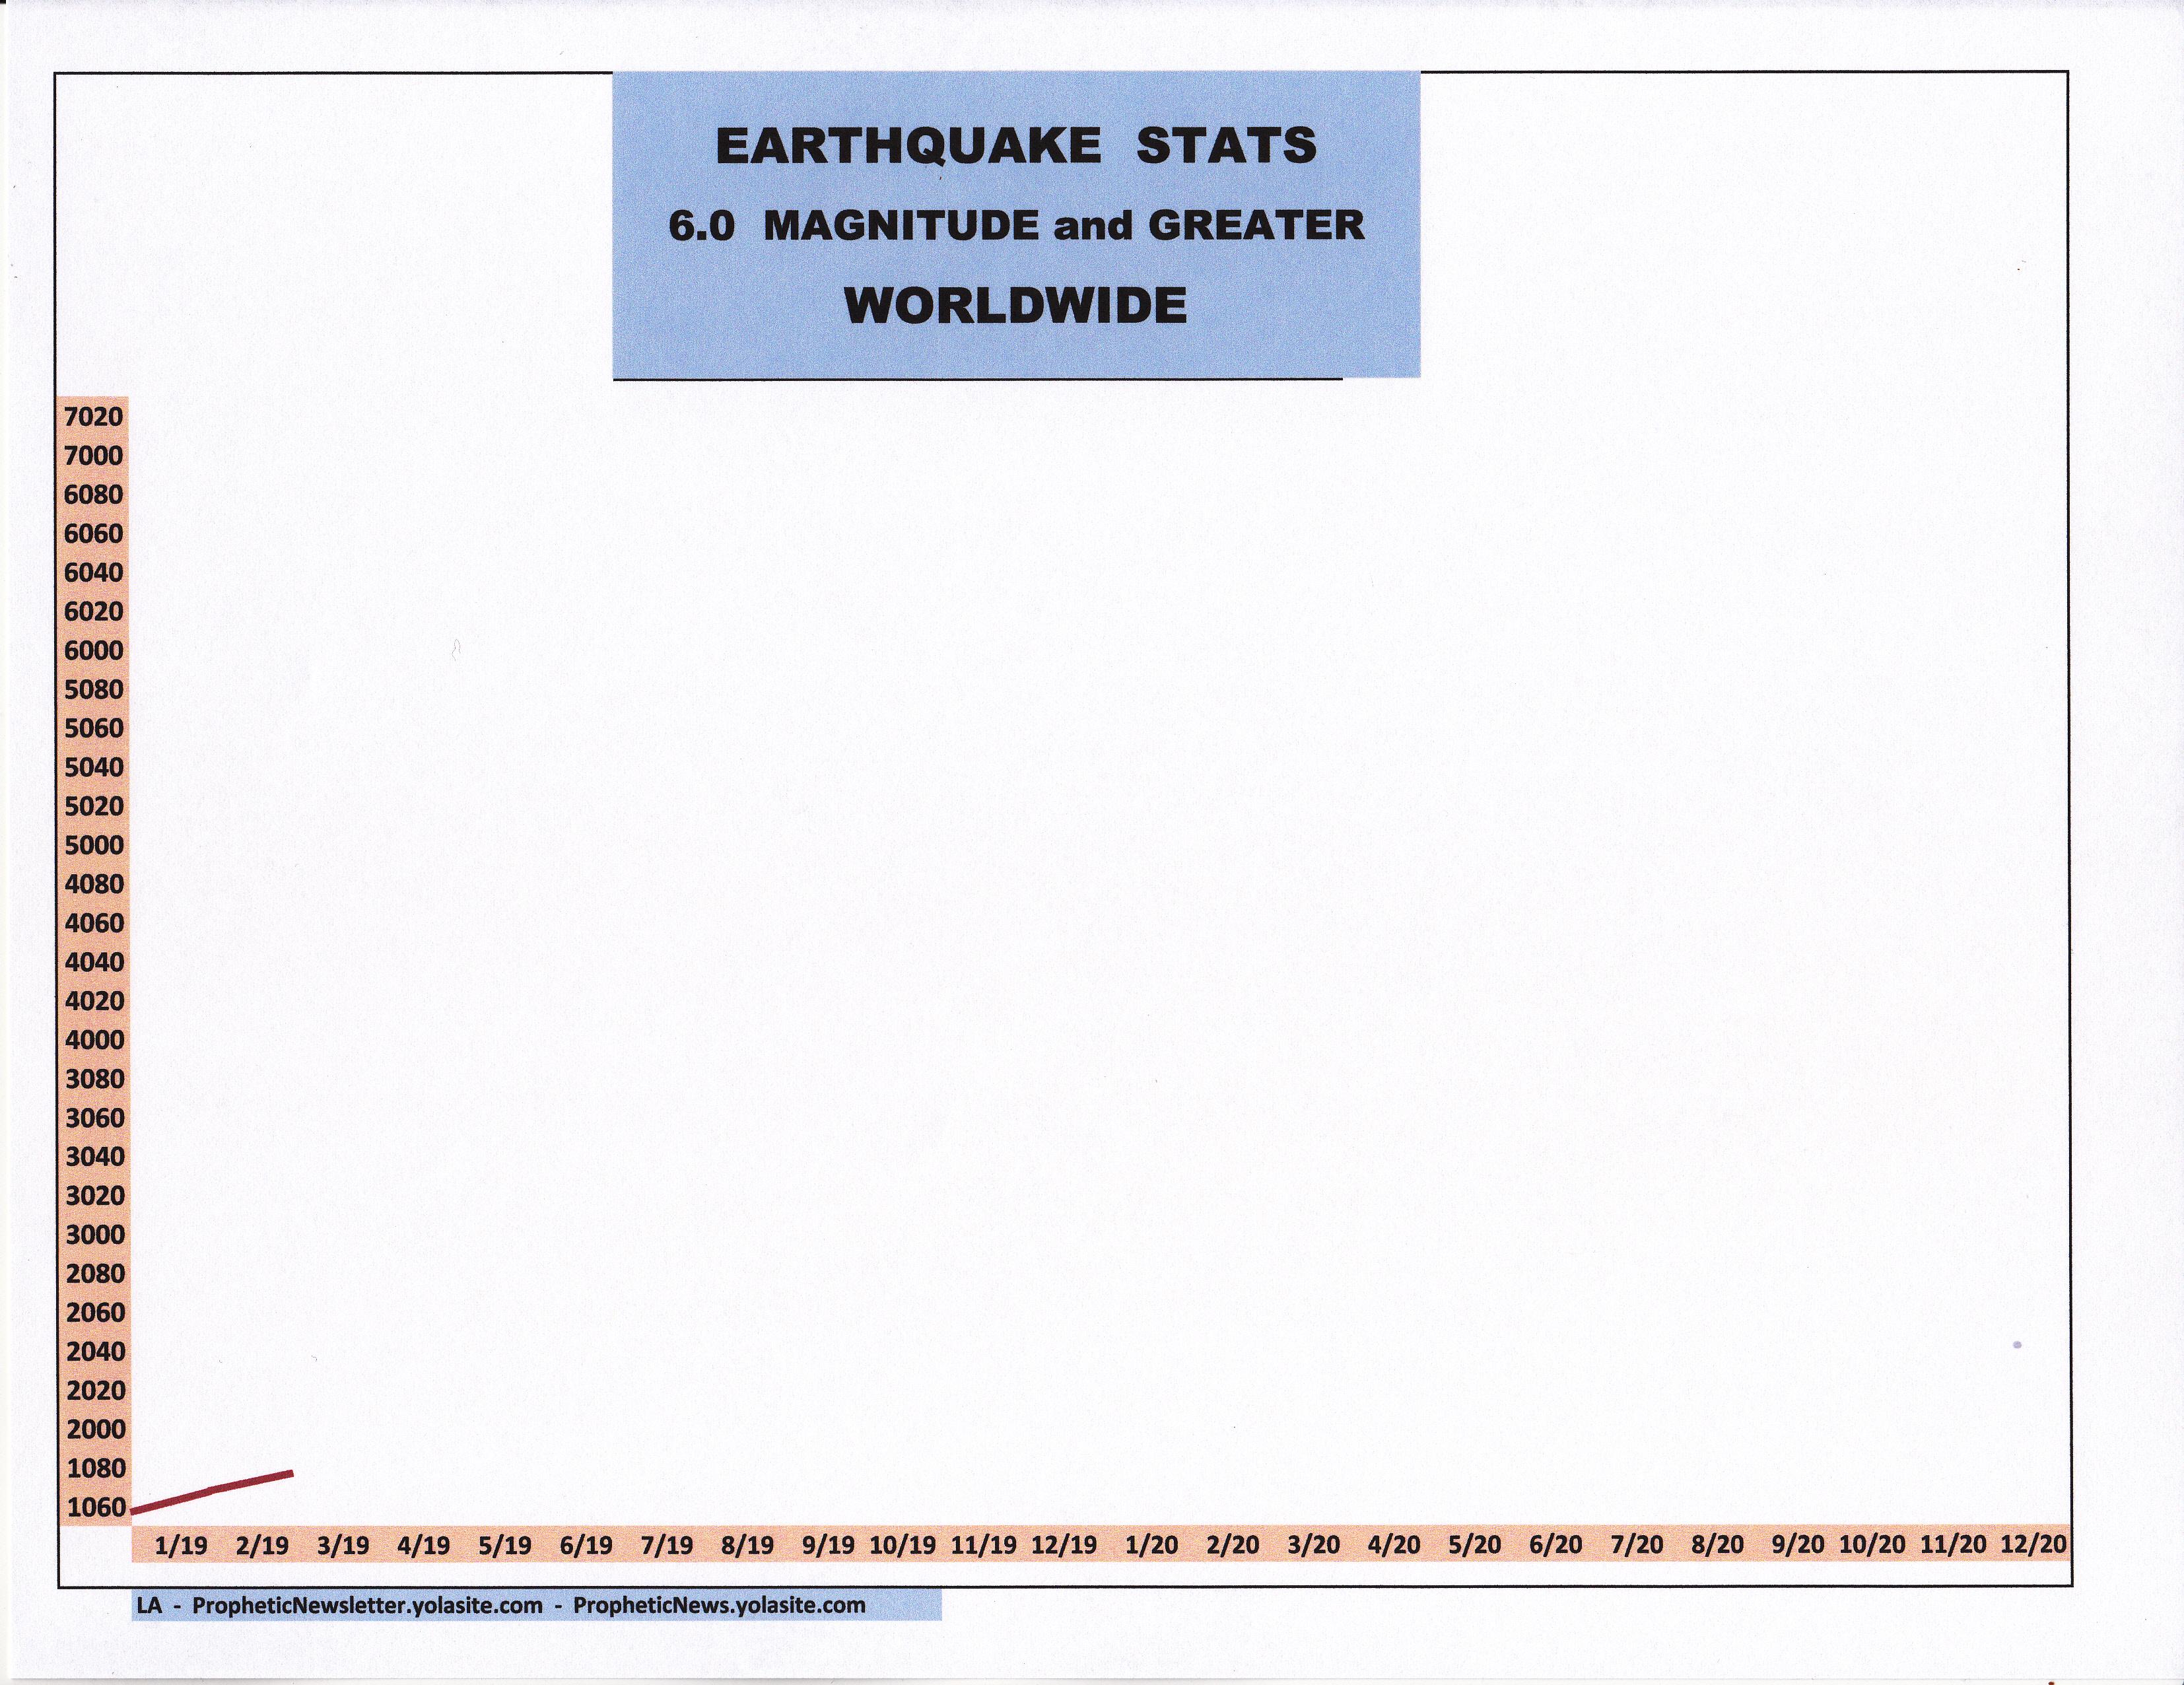 3-19 EARTHQUAKE STATS